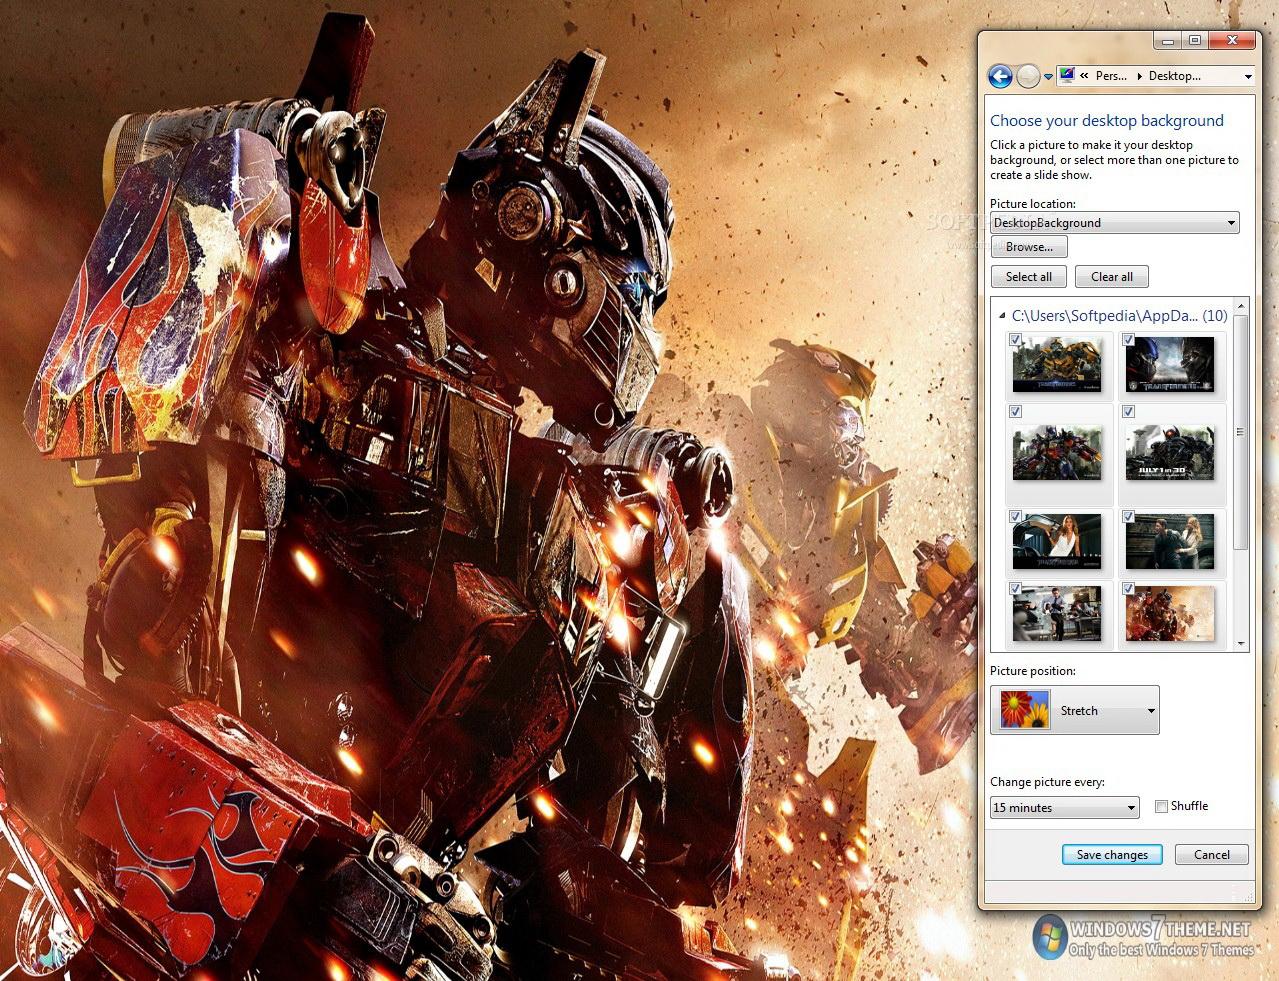 Transformers 3 Windows 7 Theme截图1